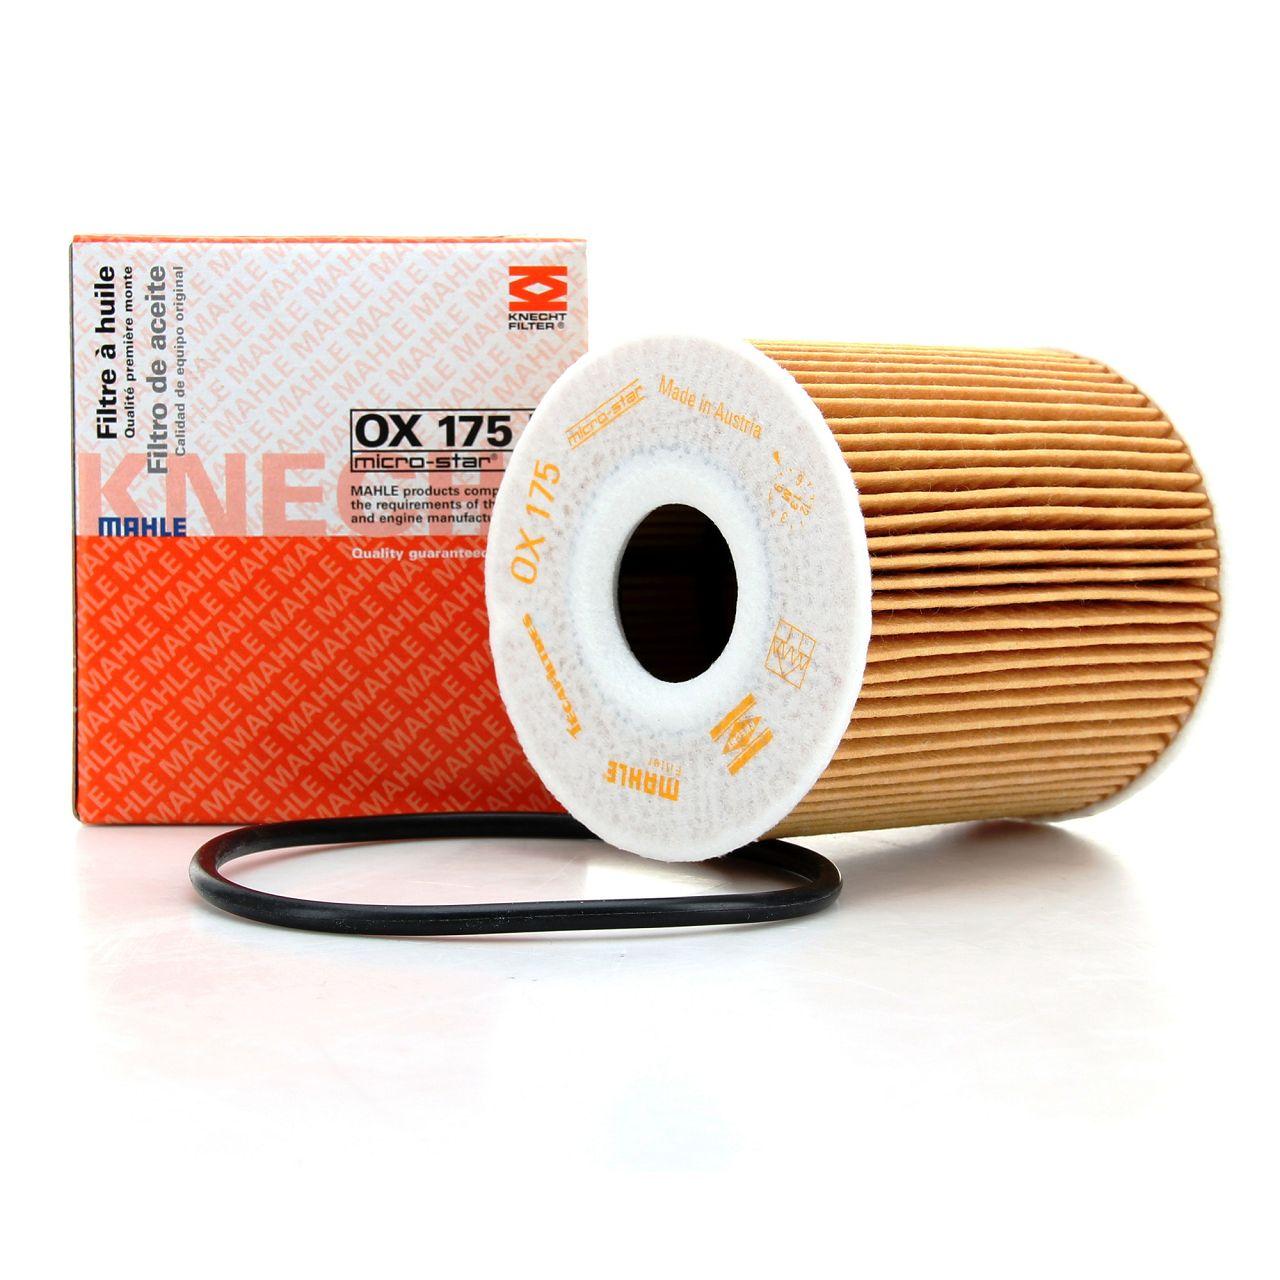 KNECHT / MAHLE Ölfilter Motorölfilter OX175D für MINI R50 R53 R52 11427512446